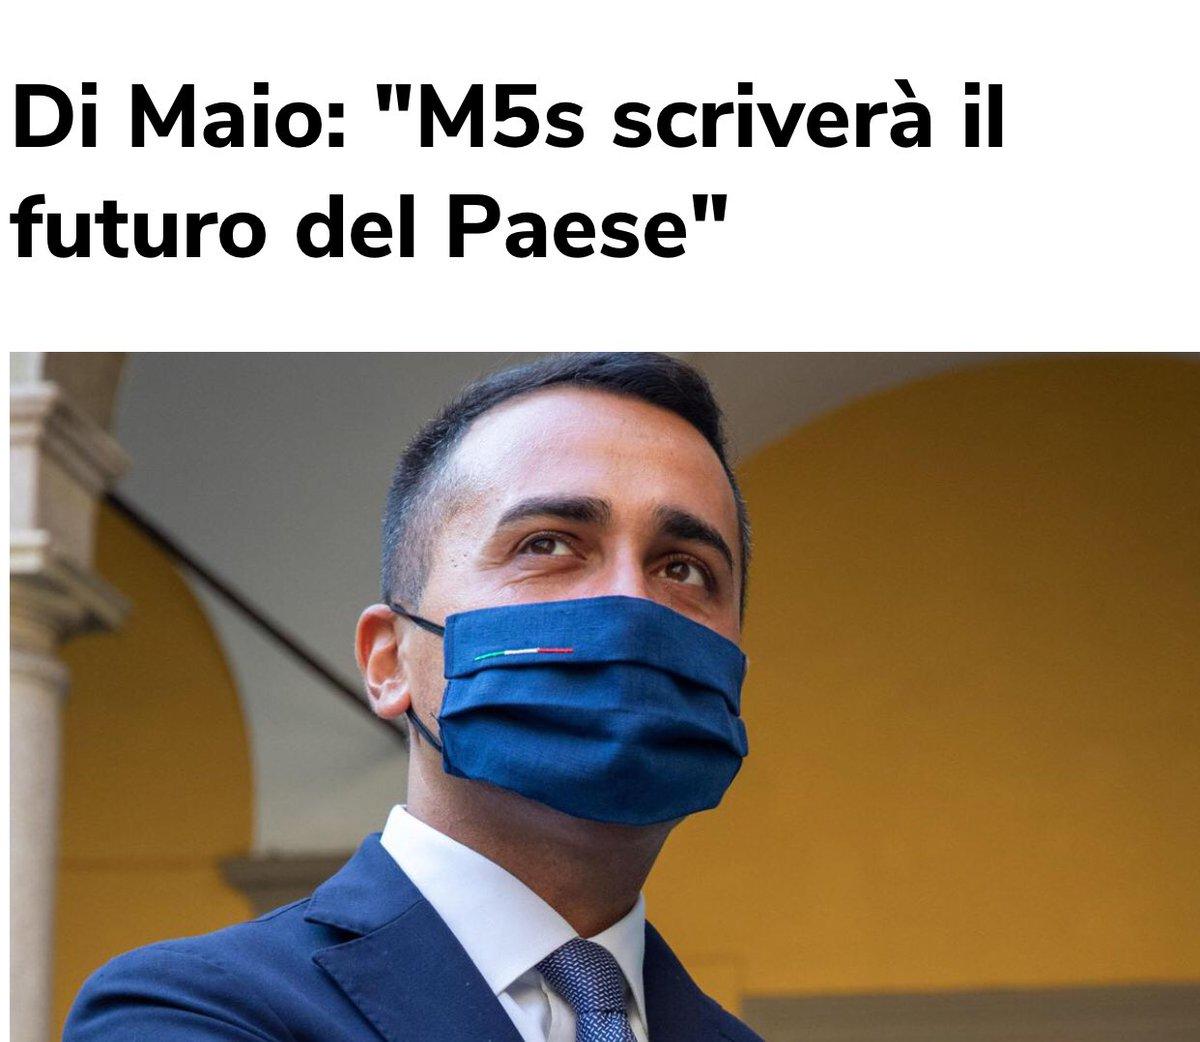 #2marzo